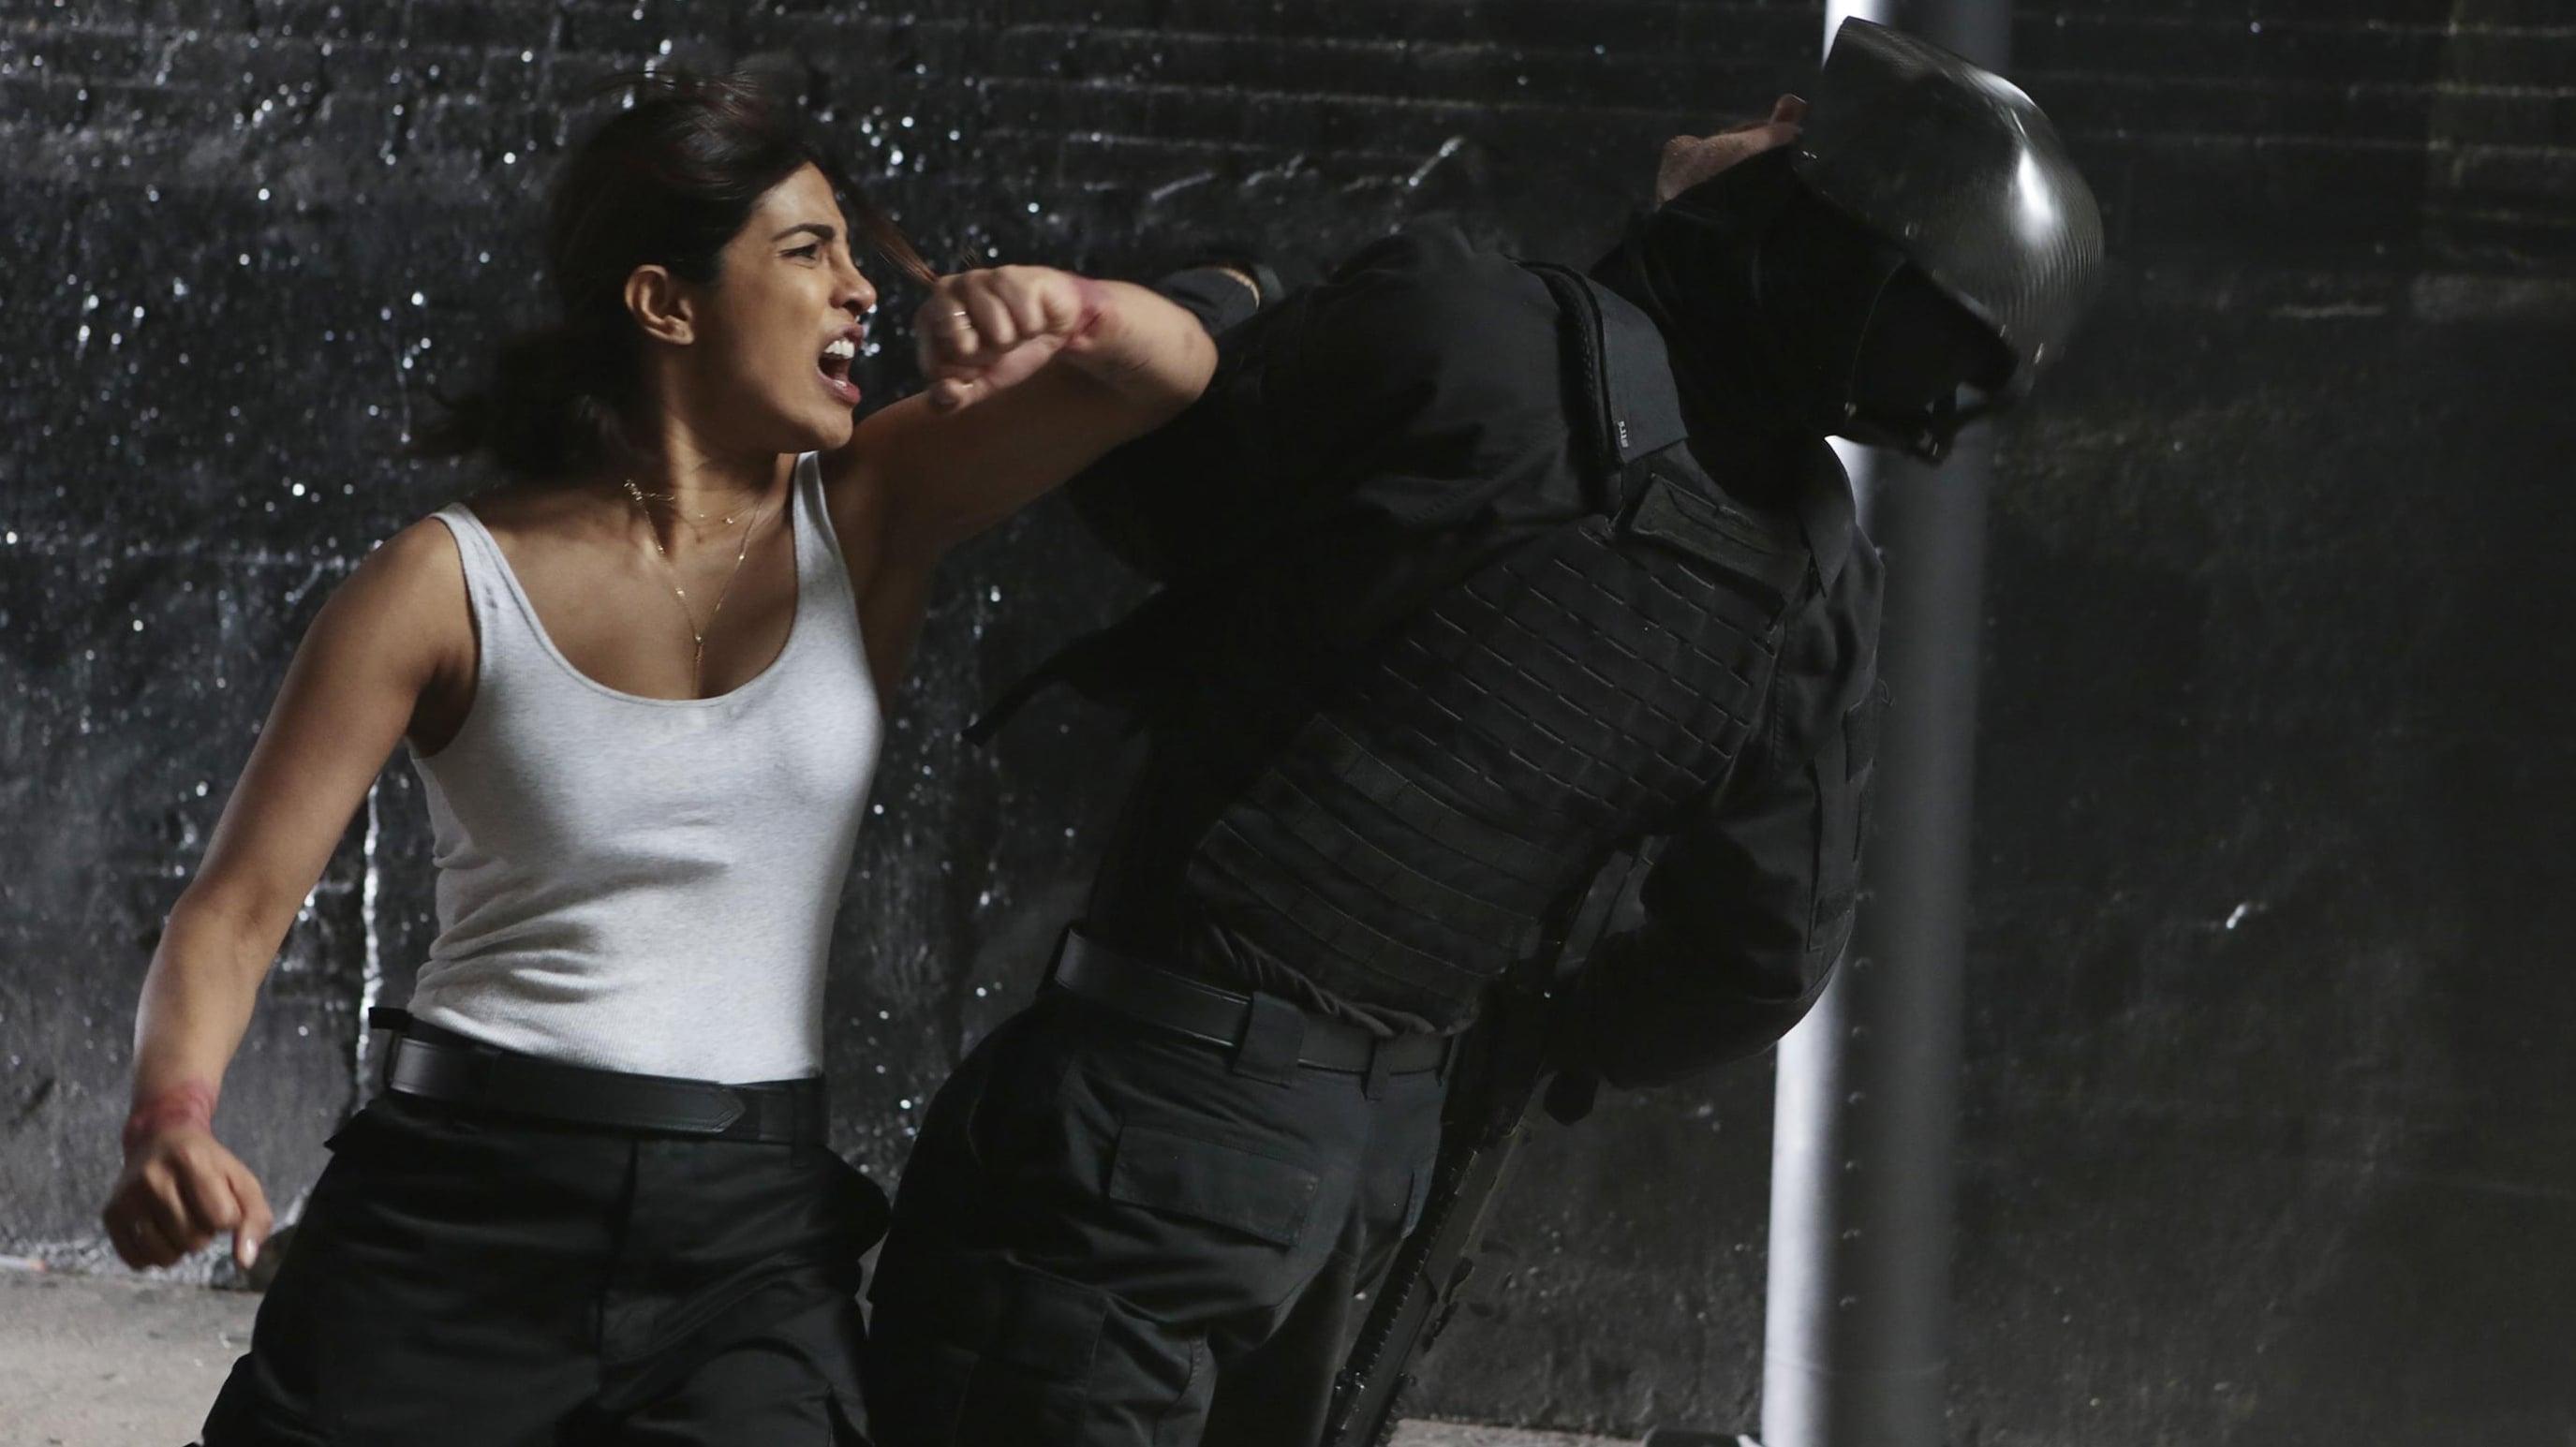 Quantico Season 2 Episode 13 S02E13 Watch Online